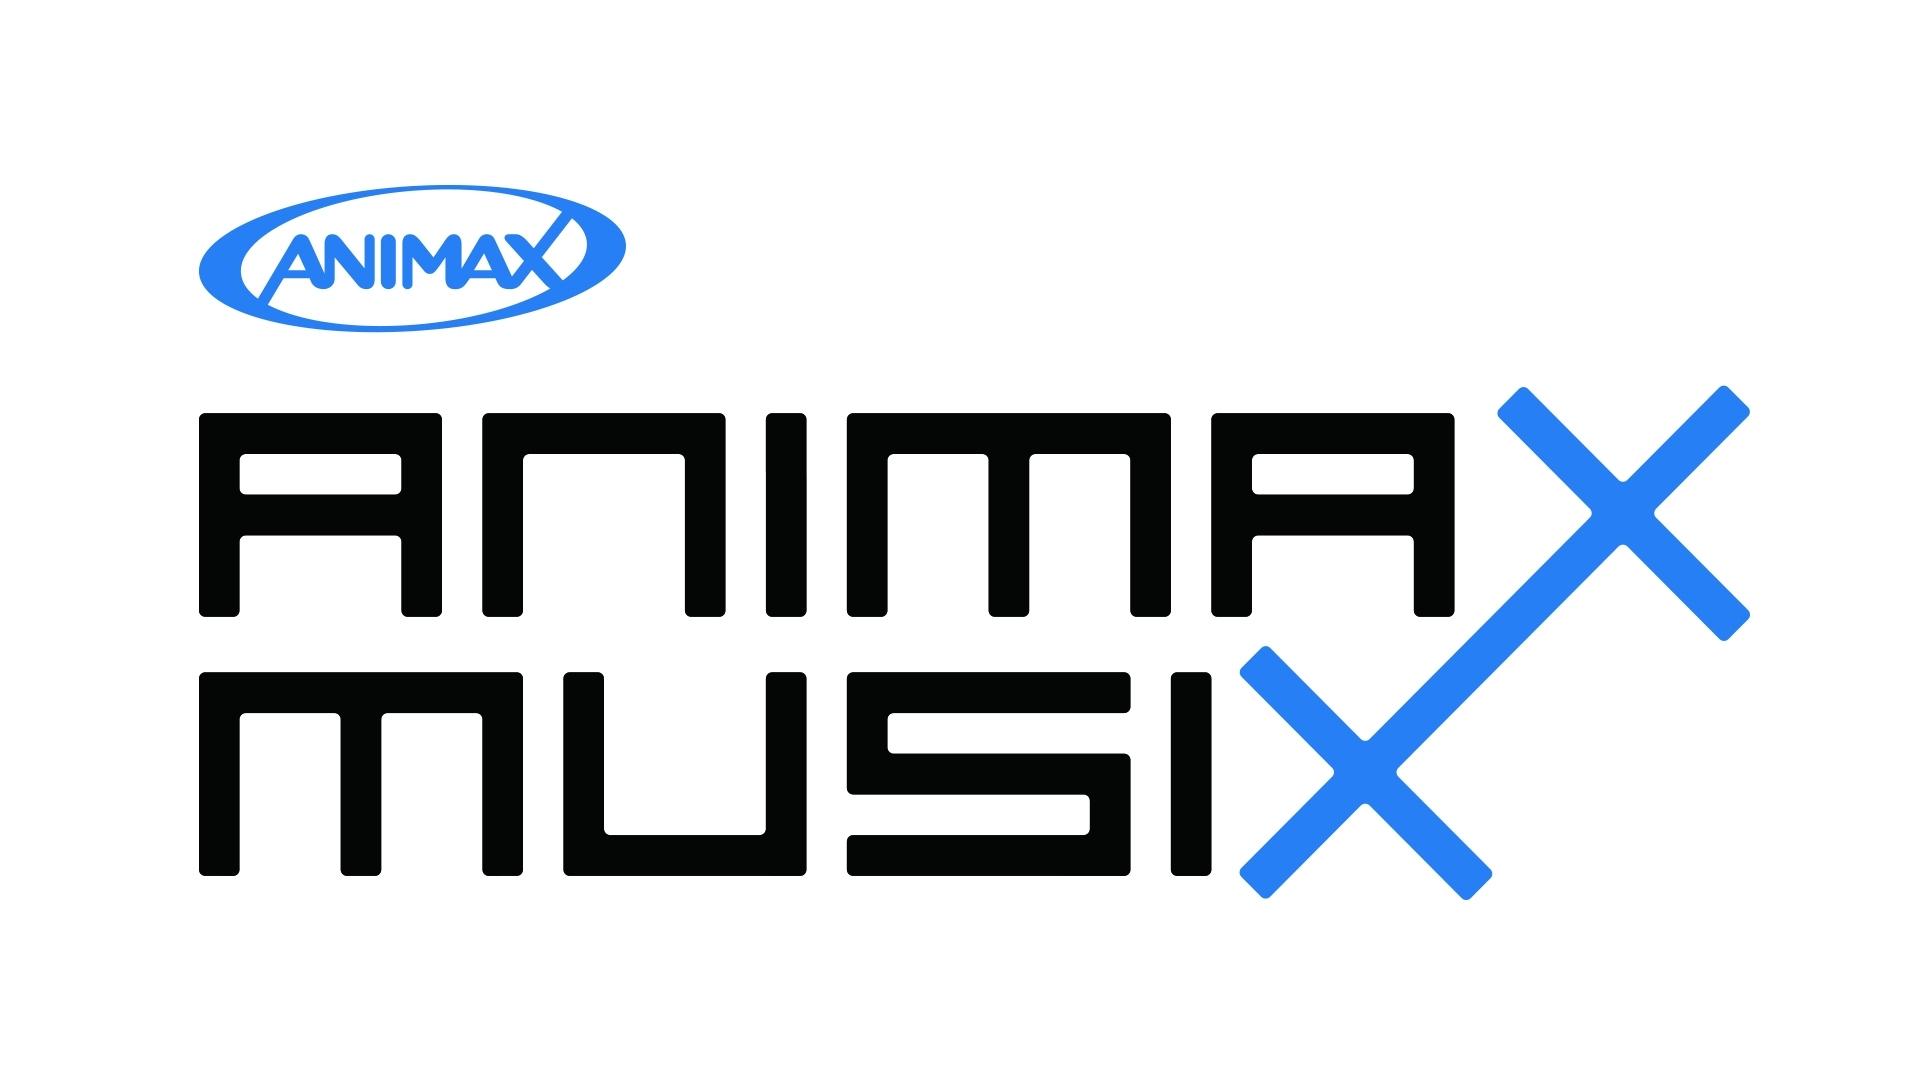 『ANIMAX MUSIX』ロゴ (C)ANIMAX MUSIX 2018-2019